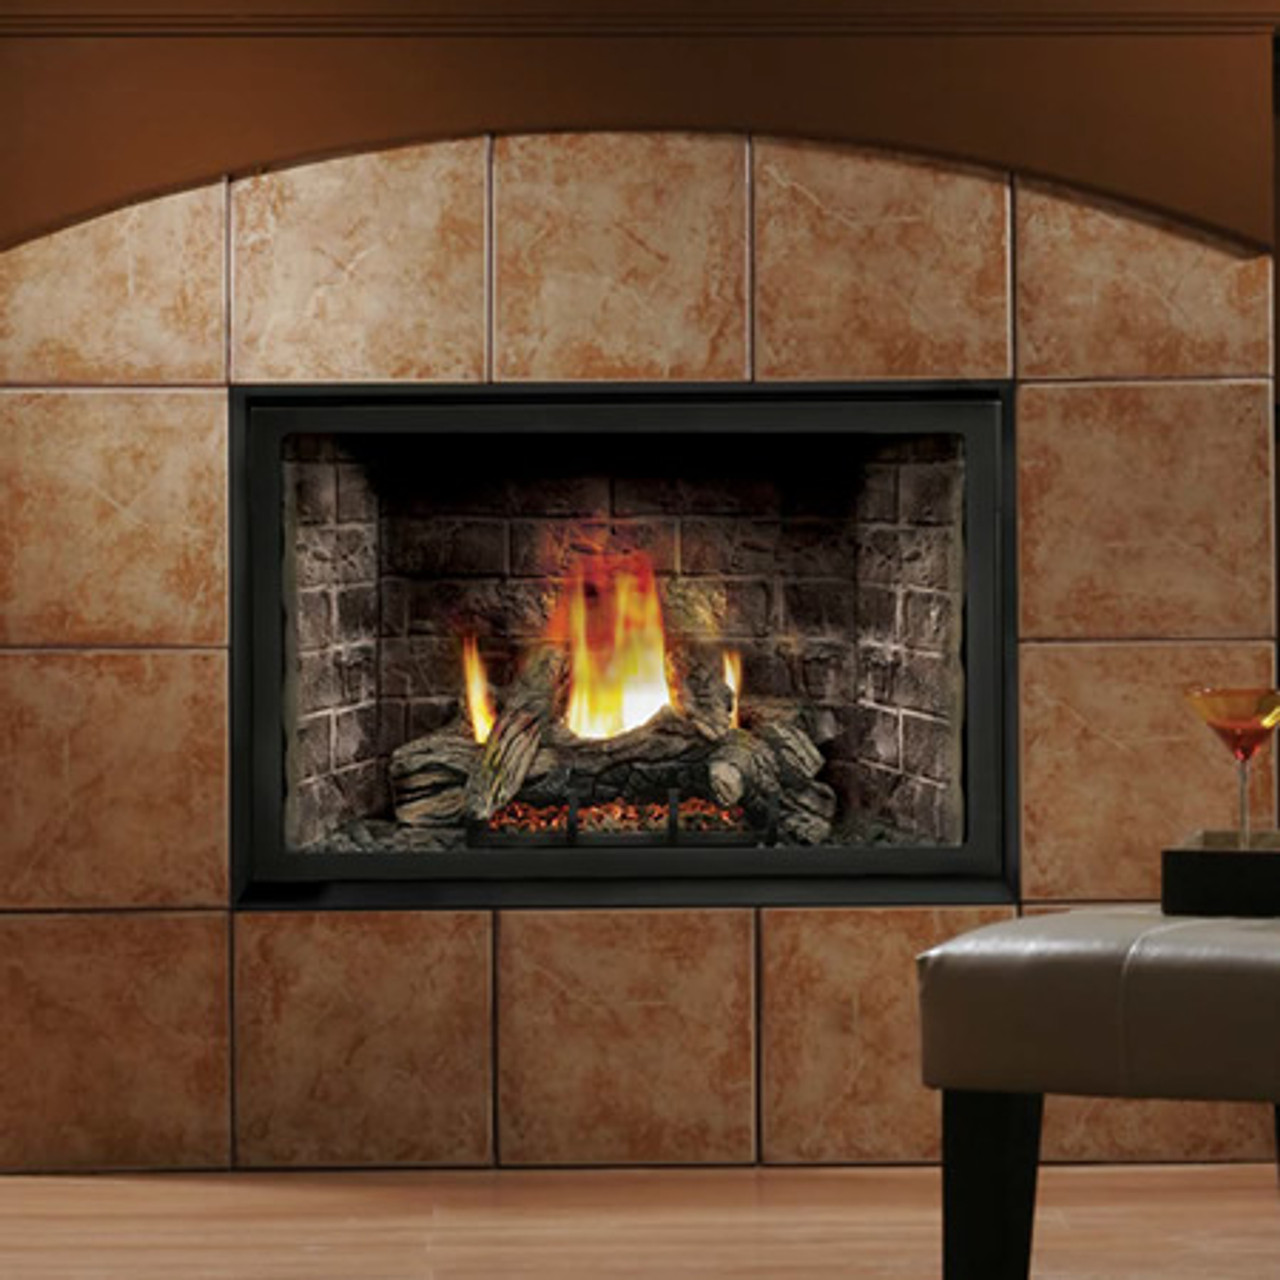 Kingsman Hb4228 Zero Clearance Direct Vent Gas Fireplace